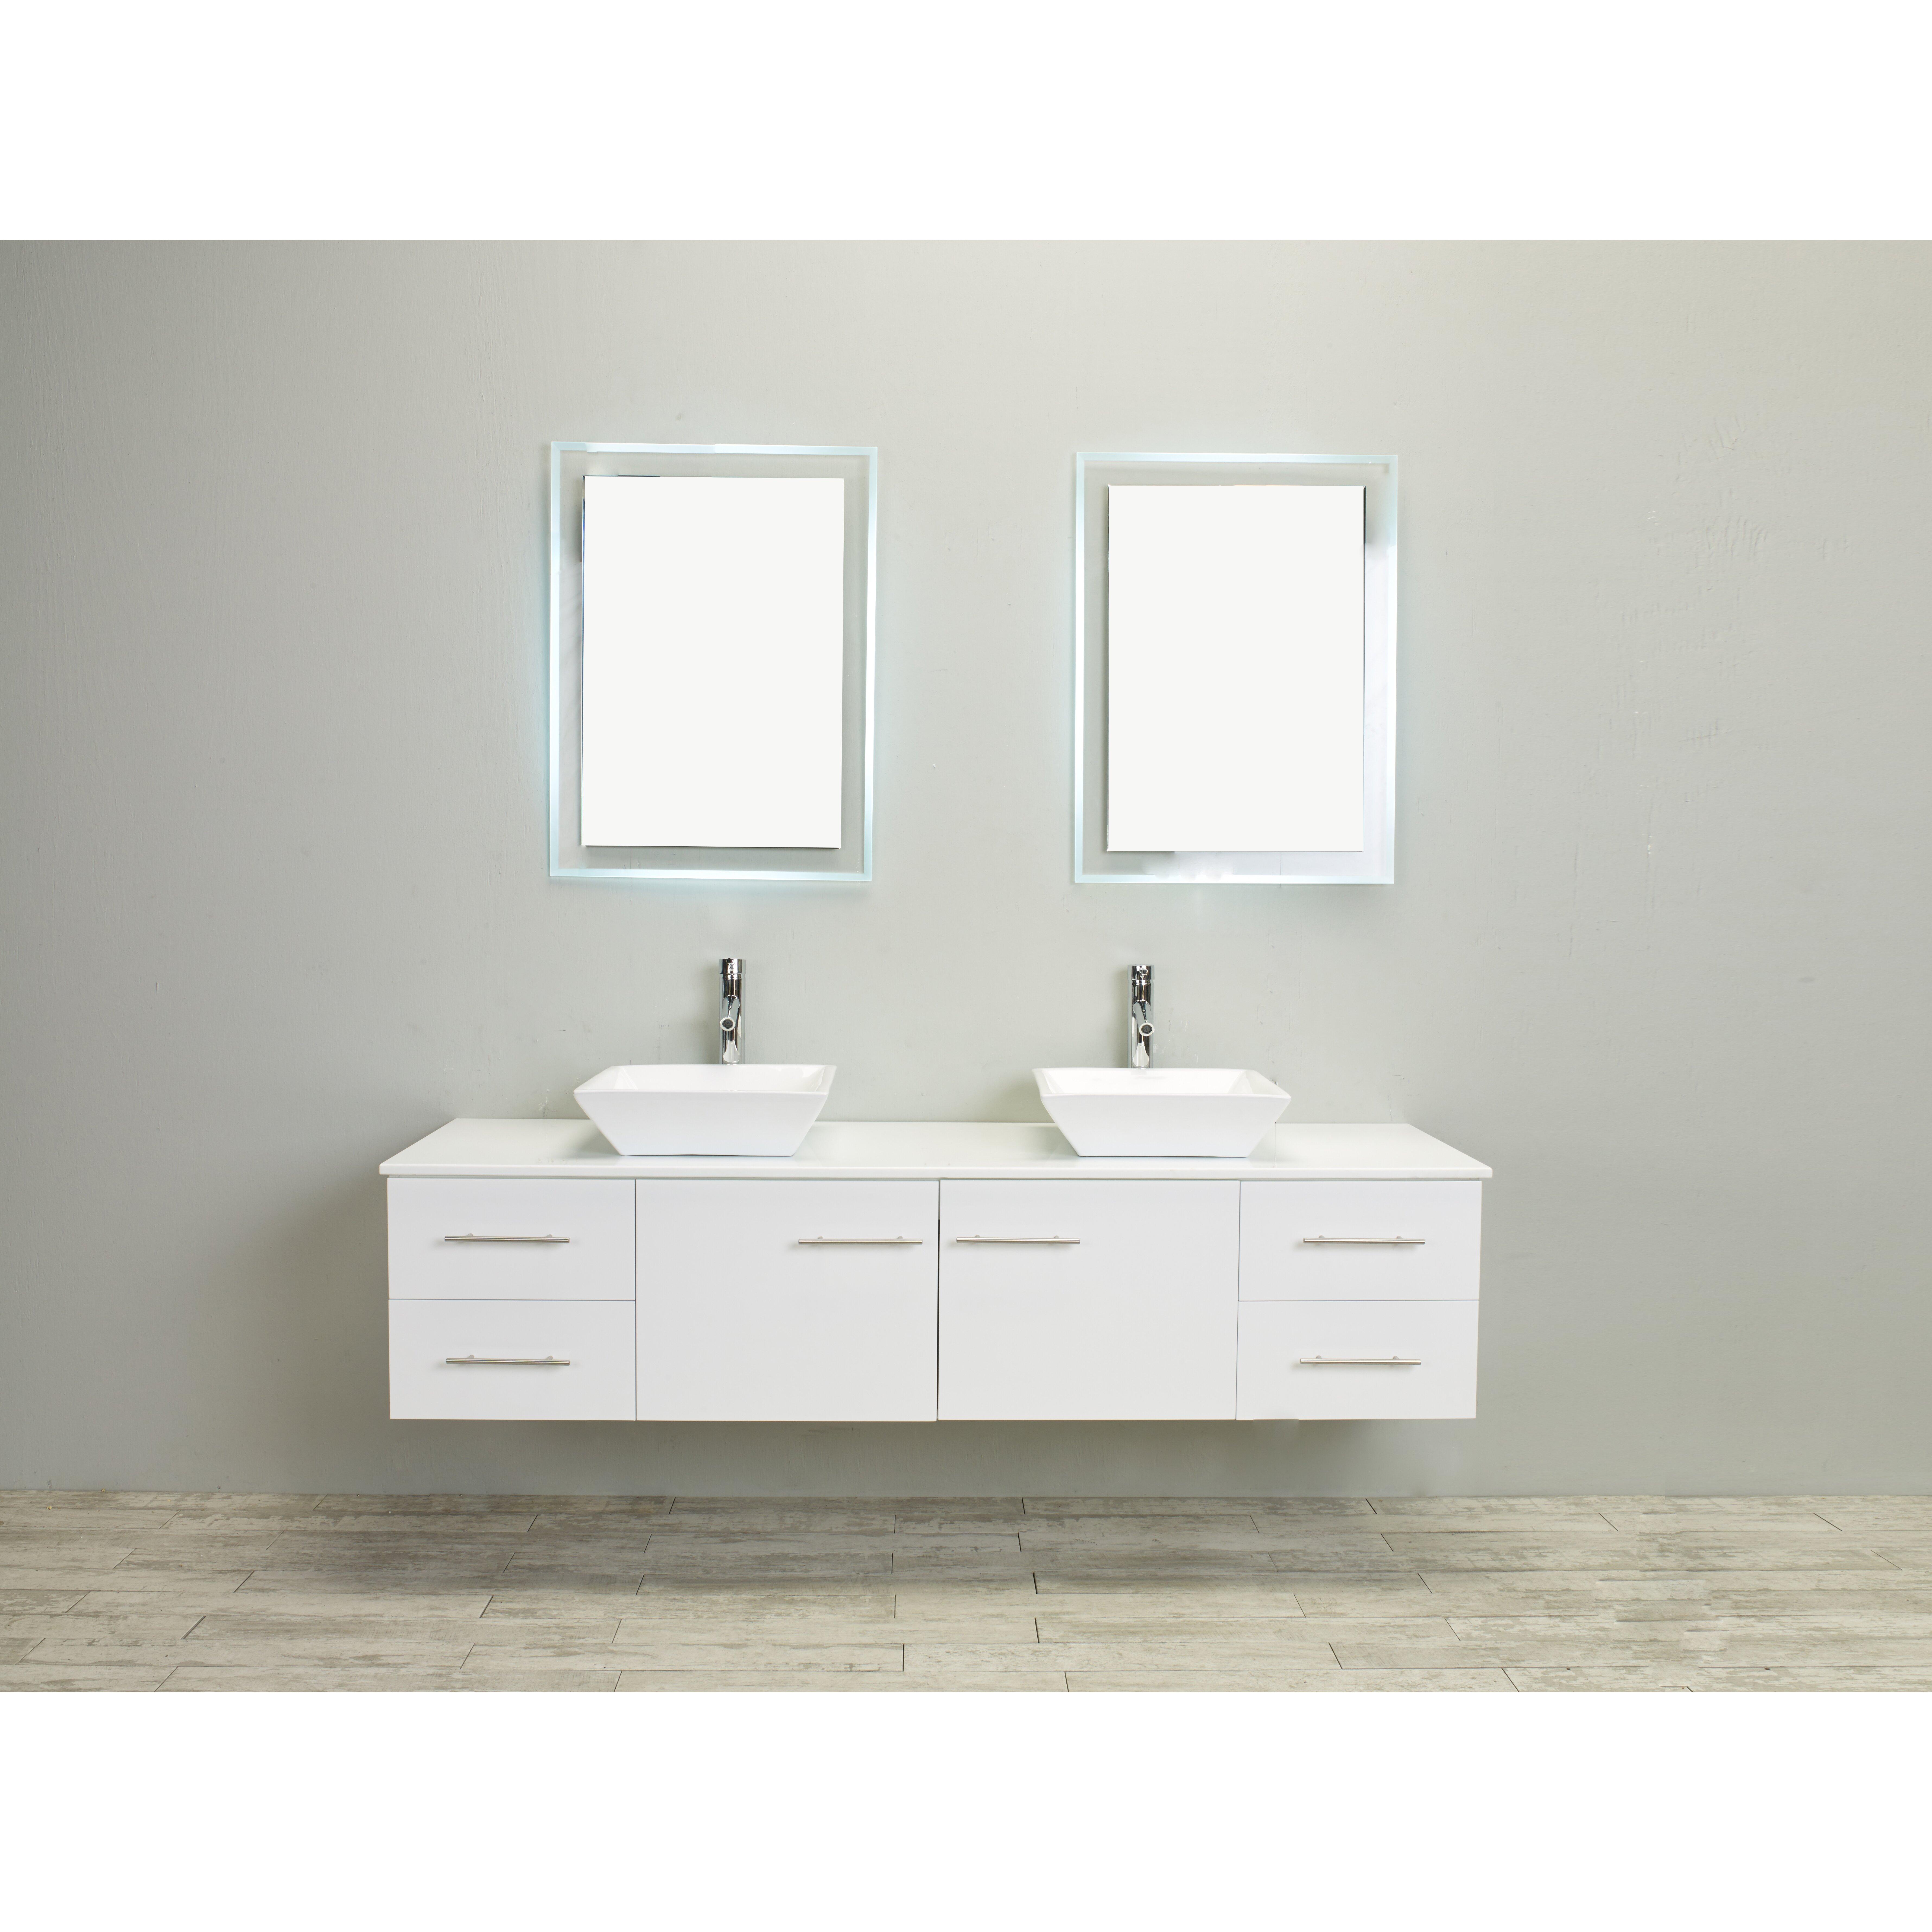 Eviva Totti Wave 72-Inch White Modern Double Sink Bathroom